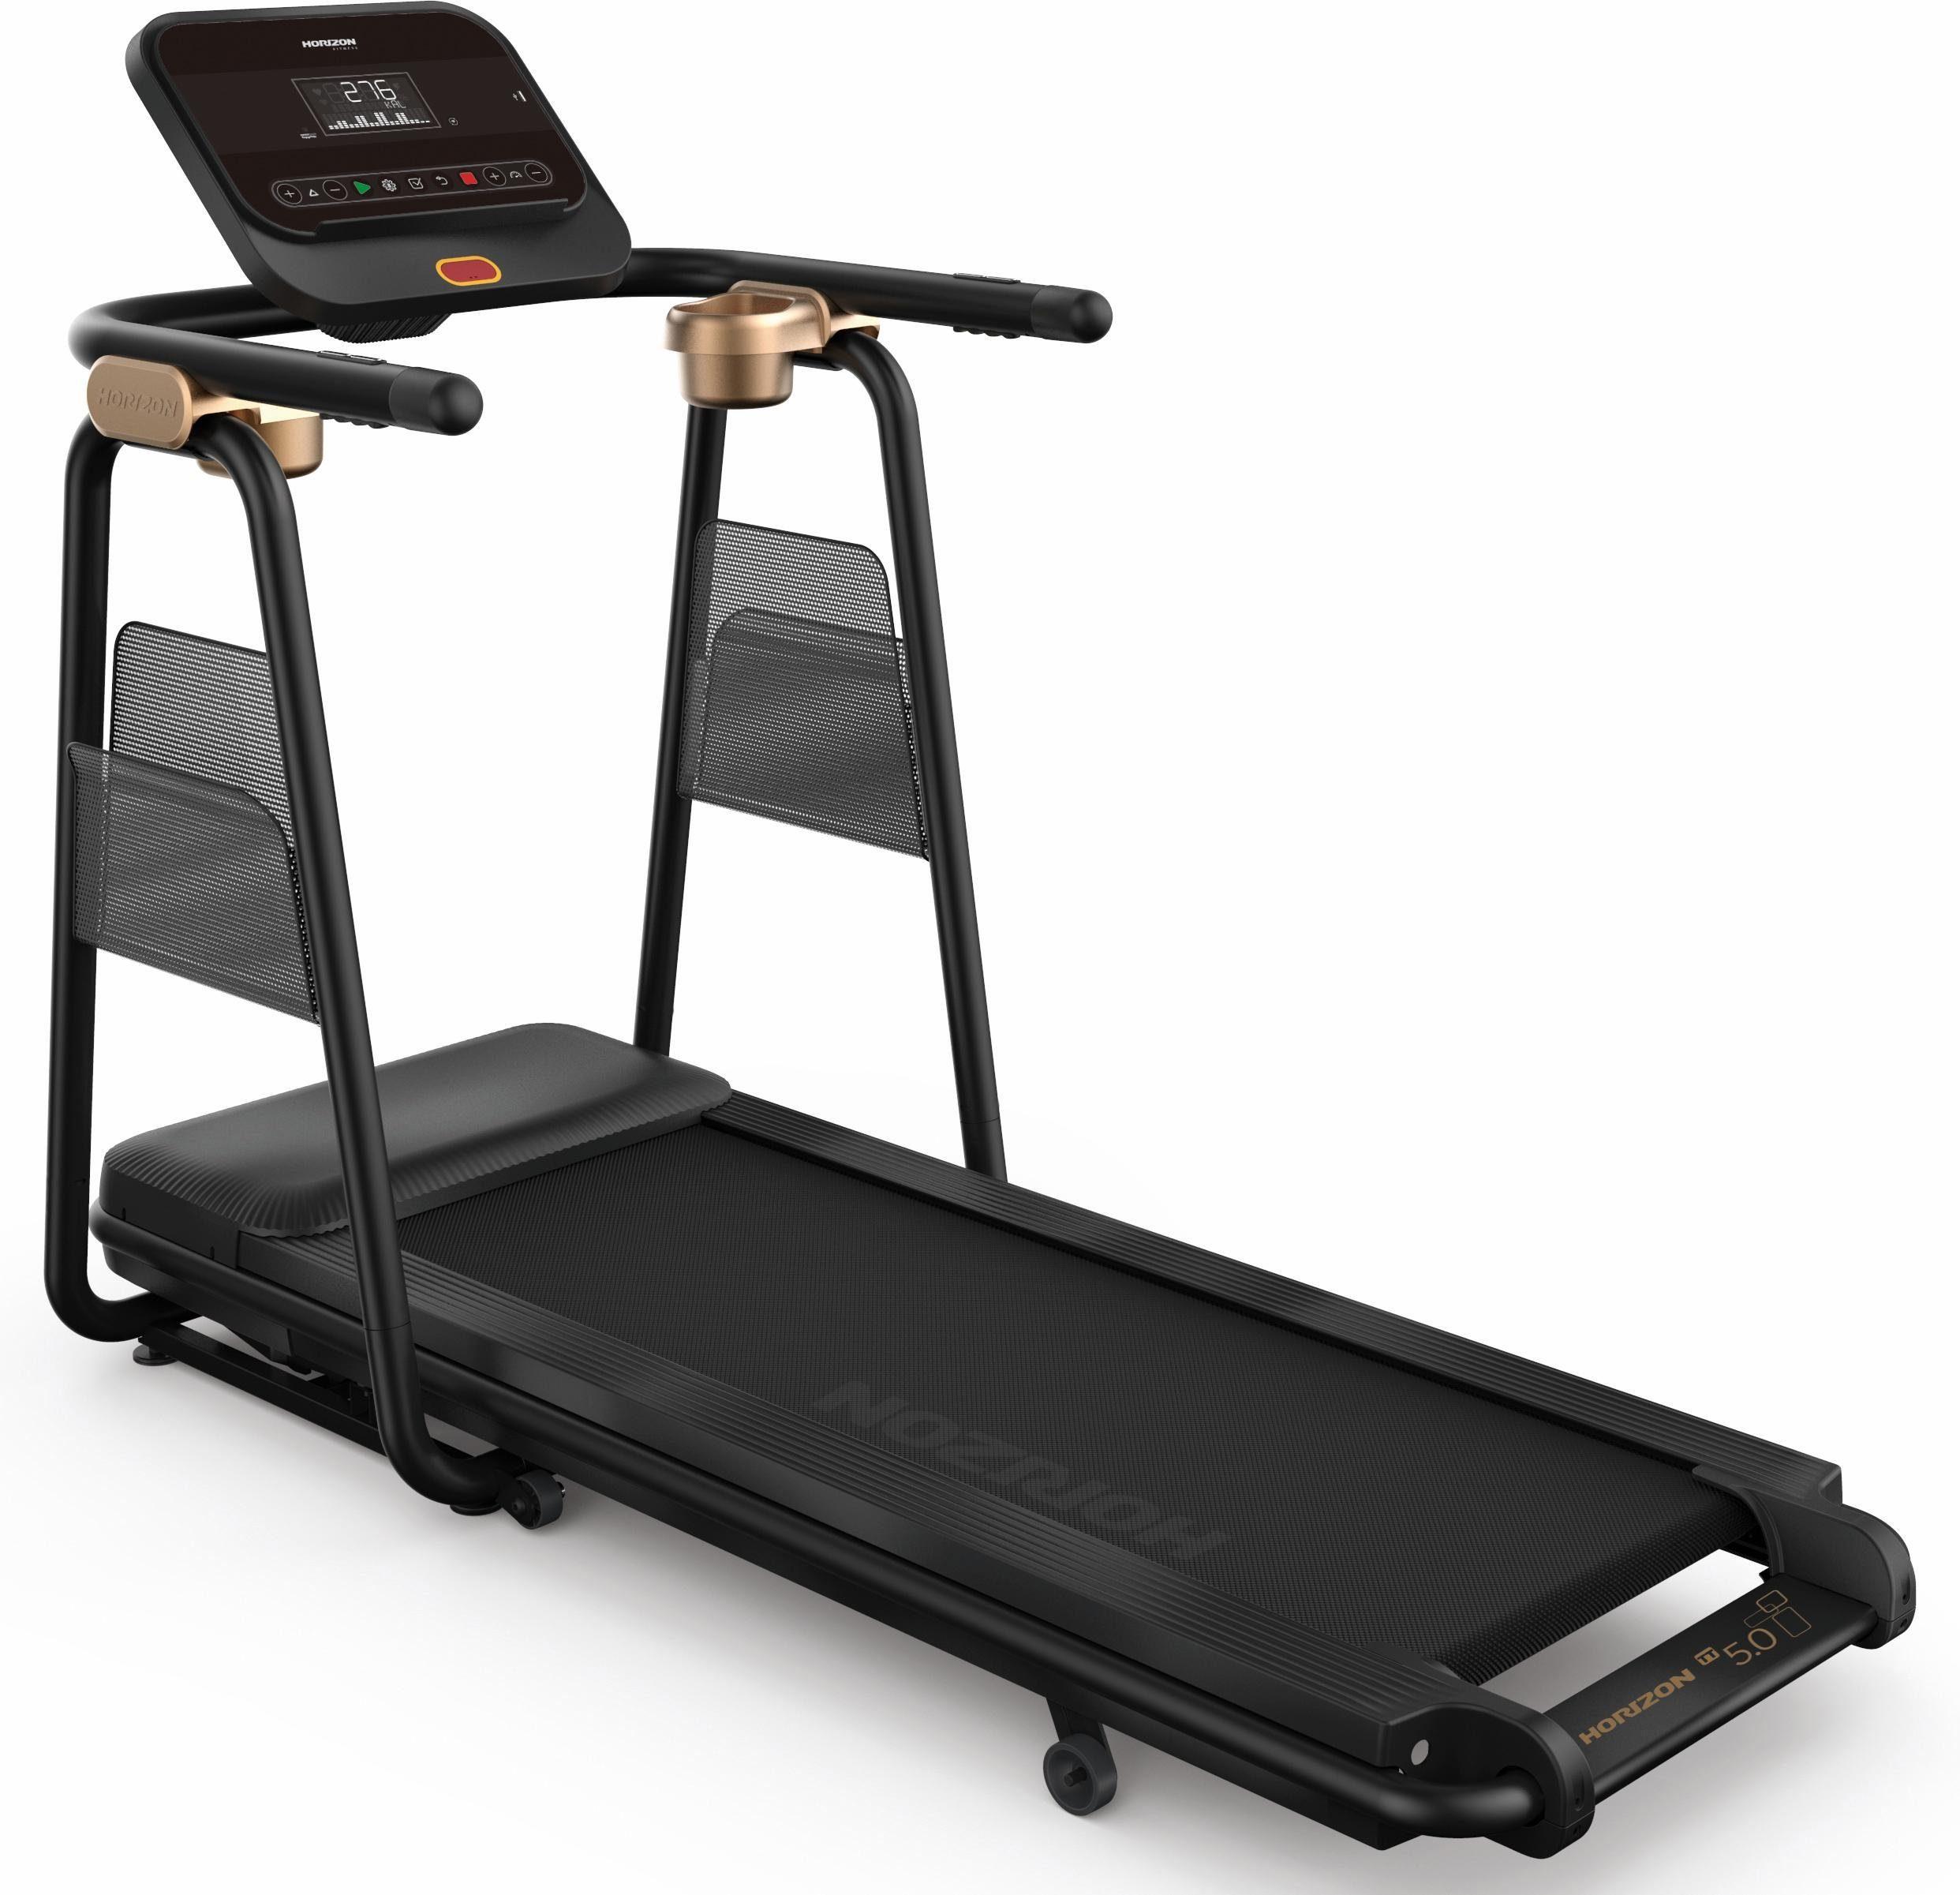 Horizon Fitness Laufband »Citta TT5.0« (Set, 2 tlg., mit Trinkflasche)